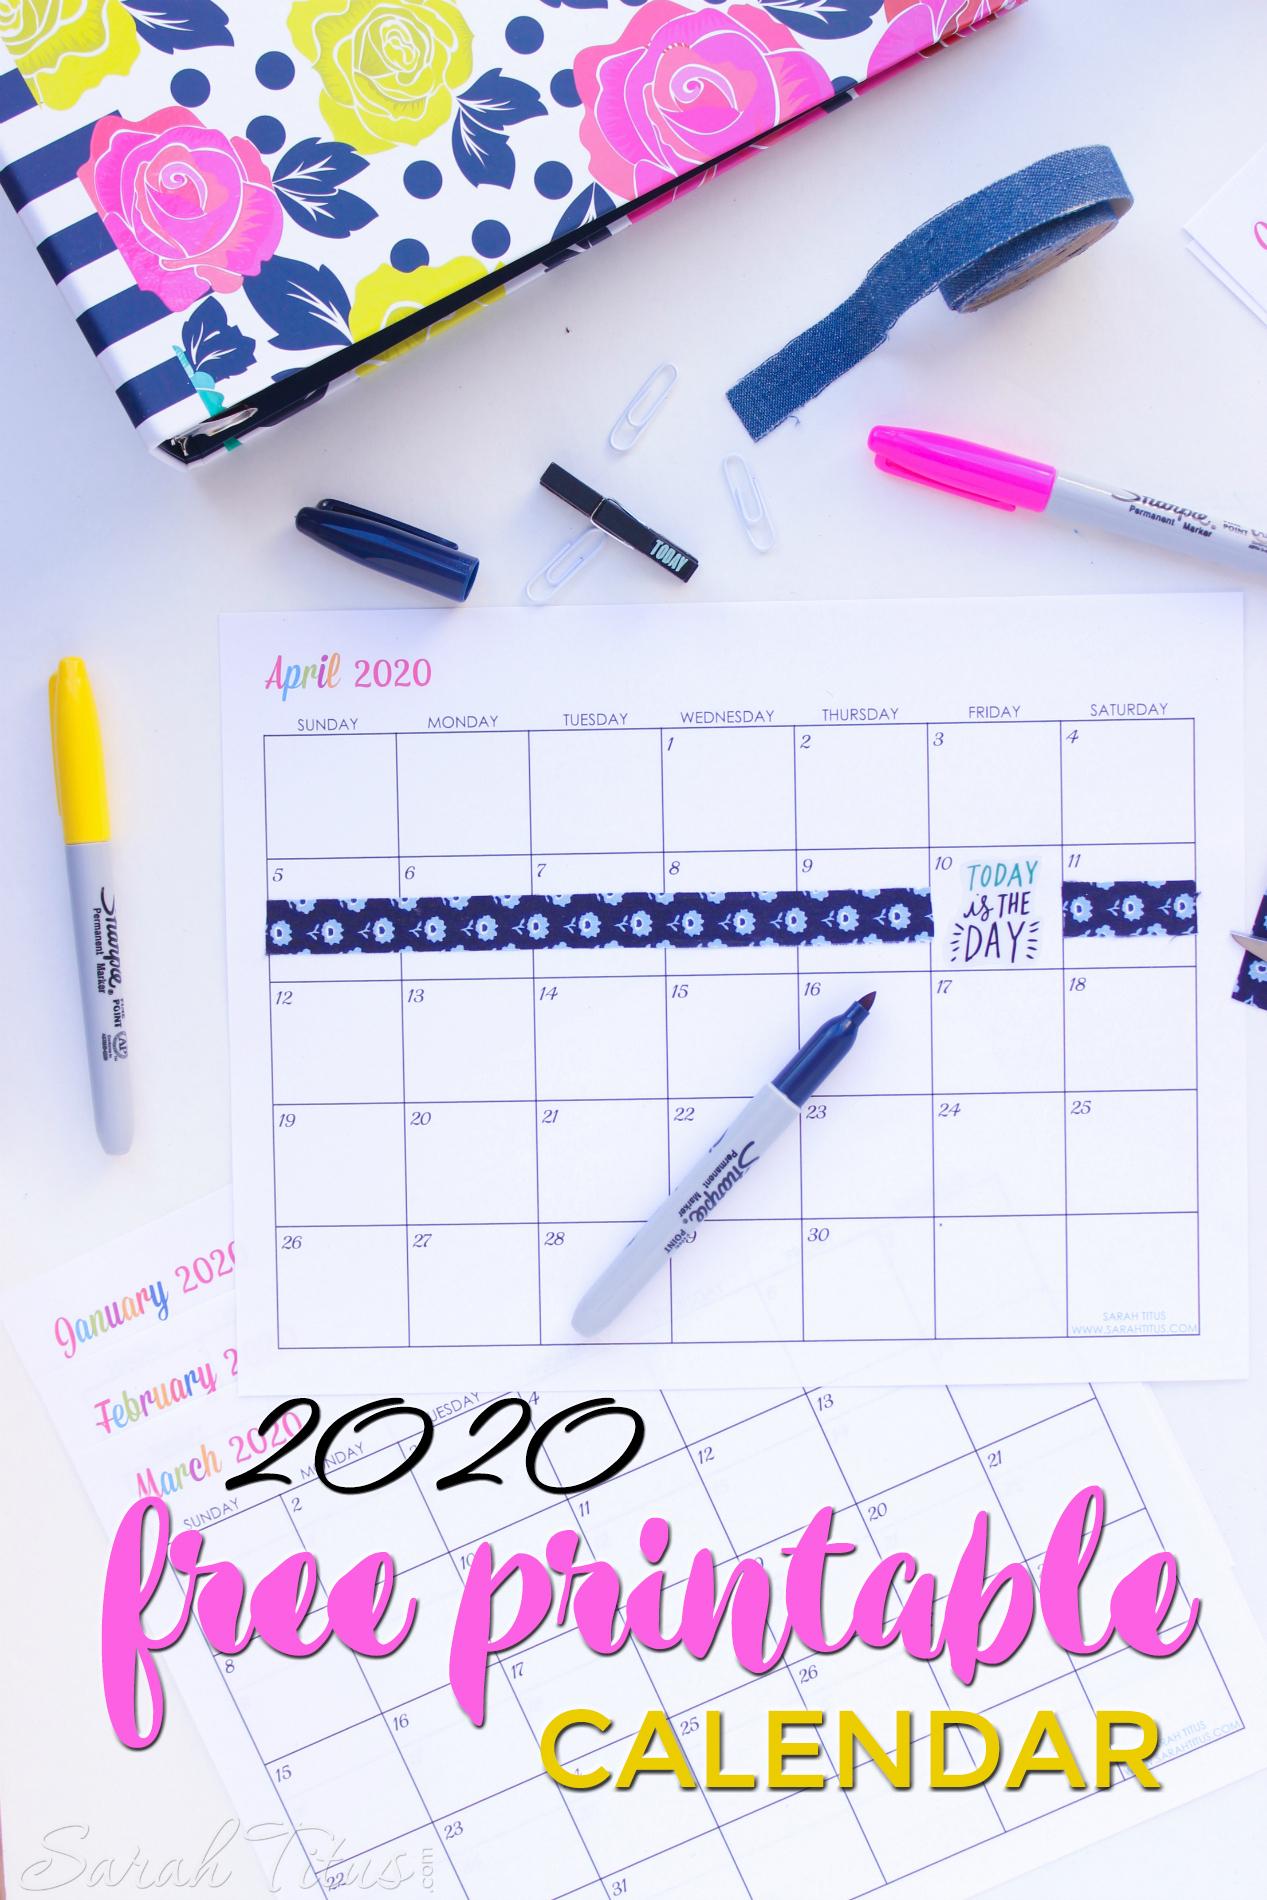 Custom Editable 2020 Free Printable Calendars - Sarah Titus for 2020 Calendar You Can Edit